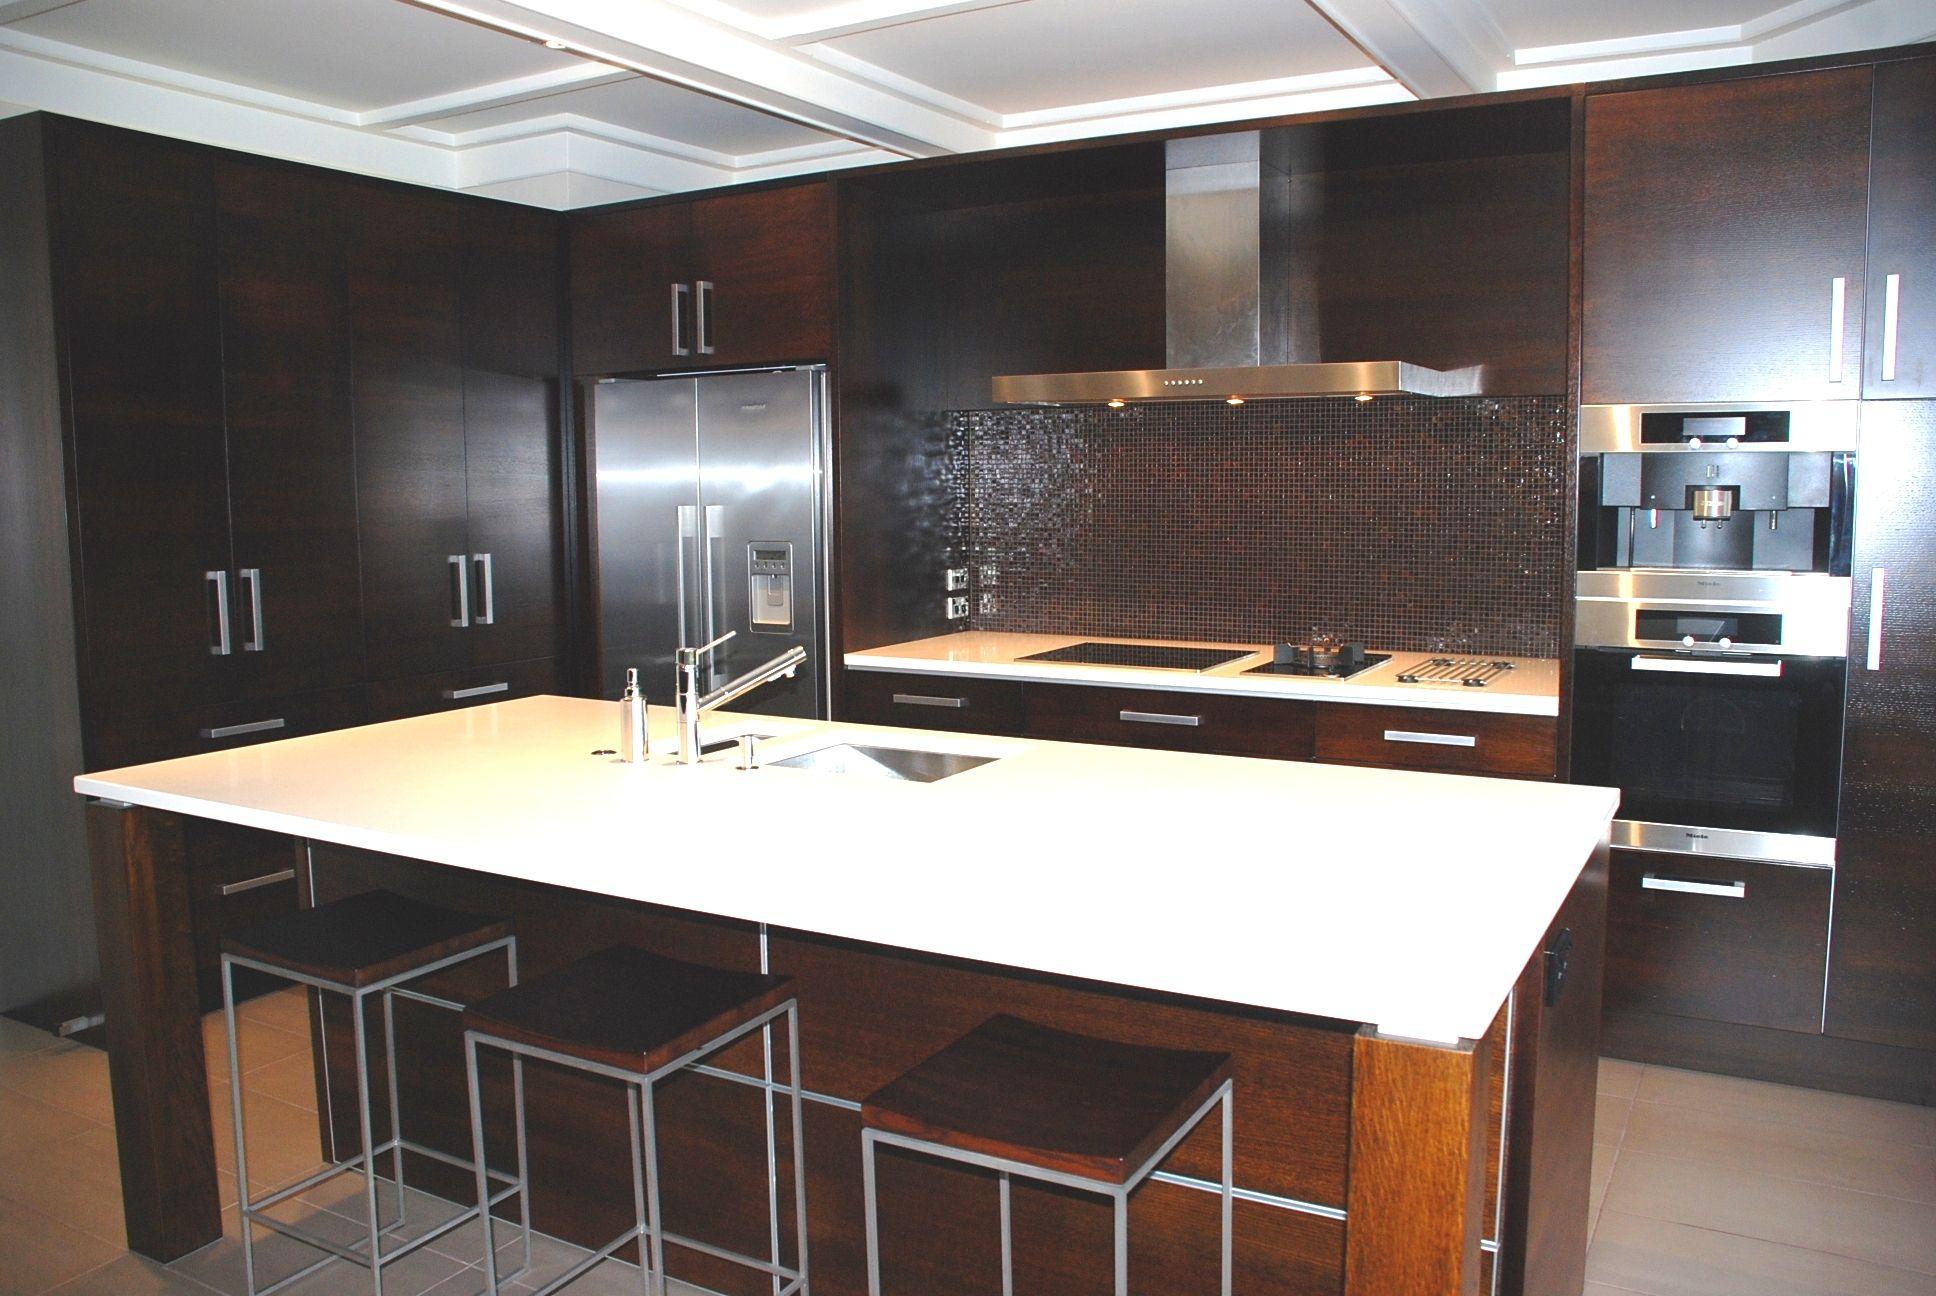 Interiorsetc Rachael Buxton Interior Designer Wwwinteriorsetcco Classy Nz Kitchen Design Decorating Inspiration